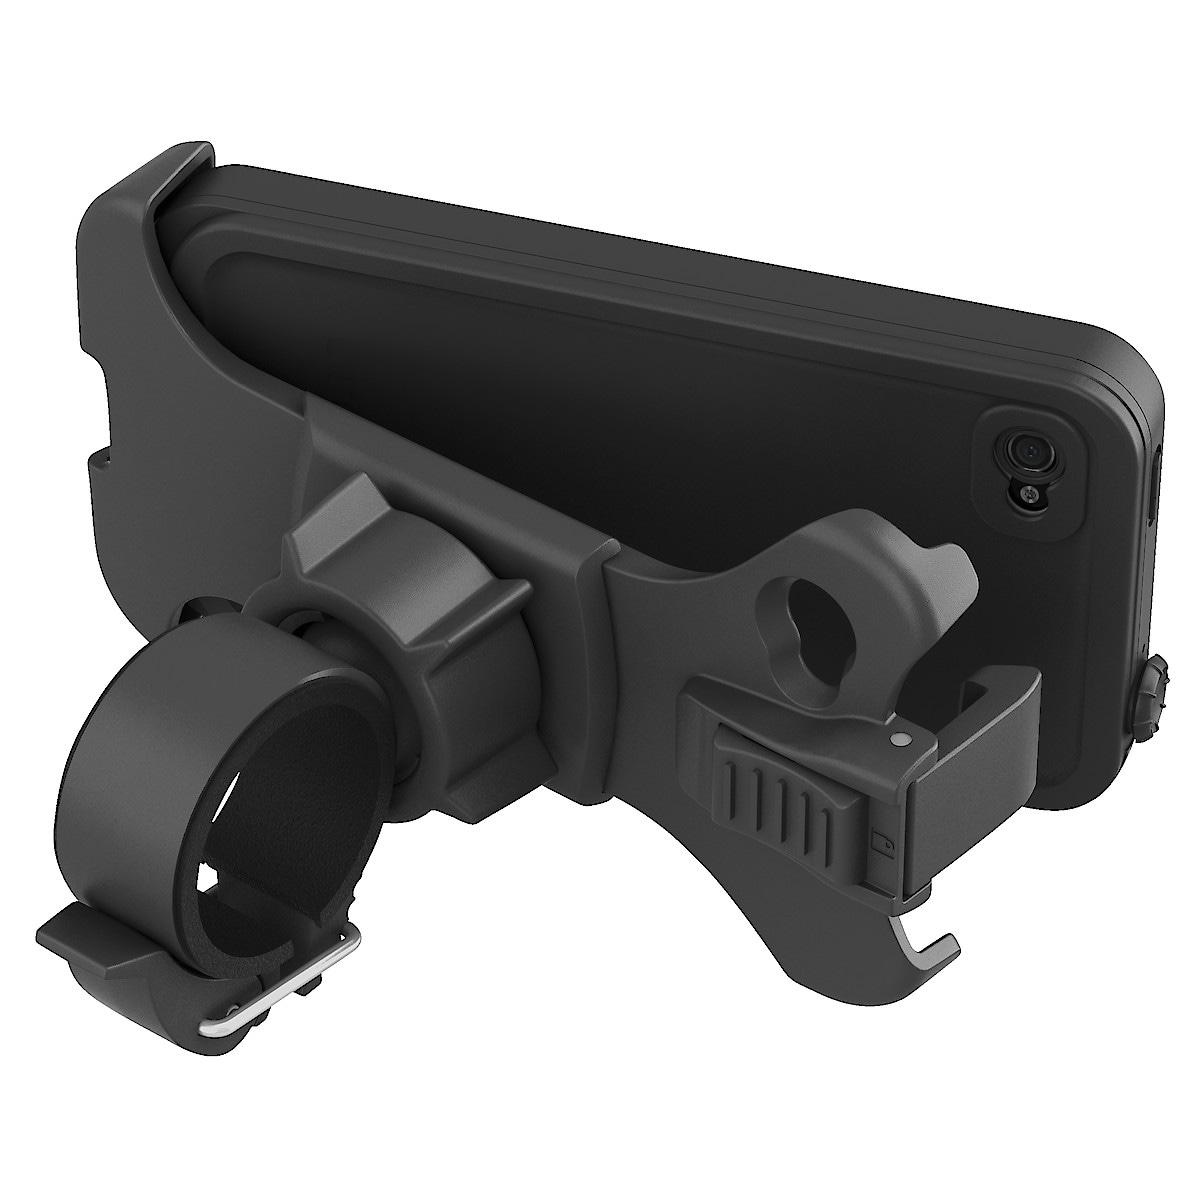 Polkupyöräkiinnike iPhone 4:lle/4S:lle Lifeproof